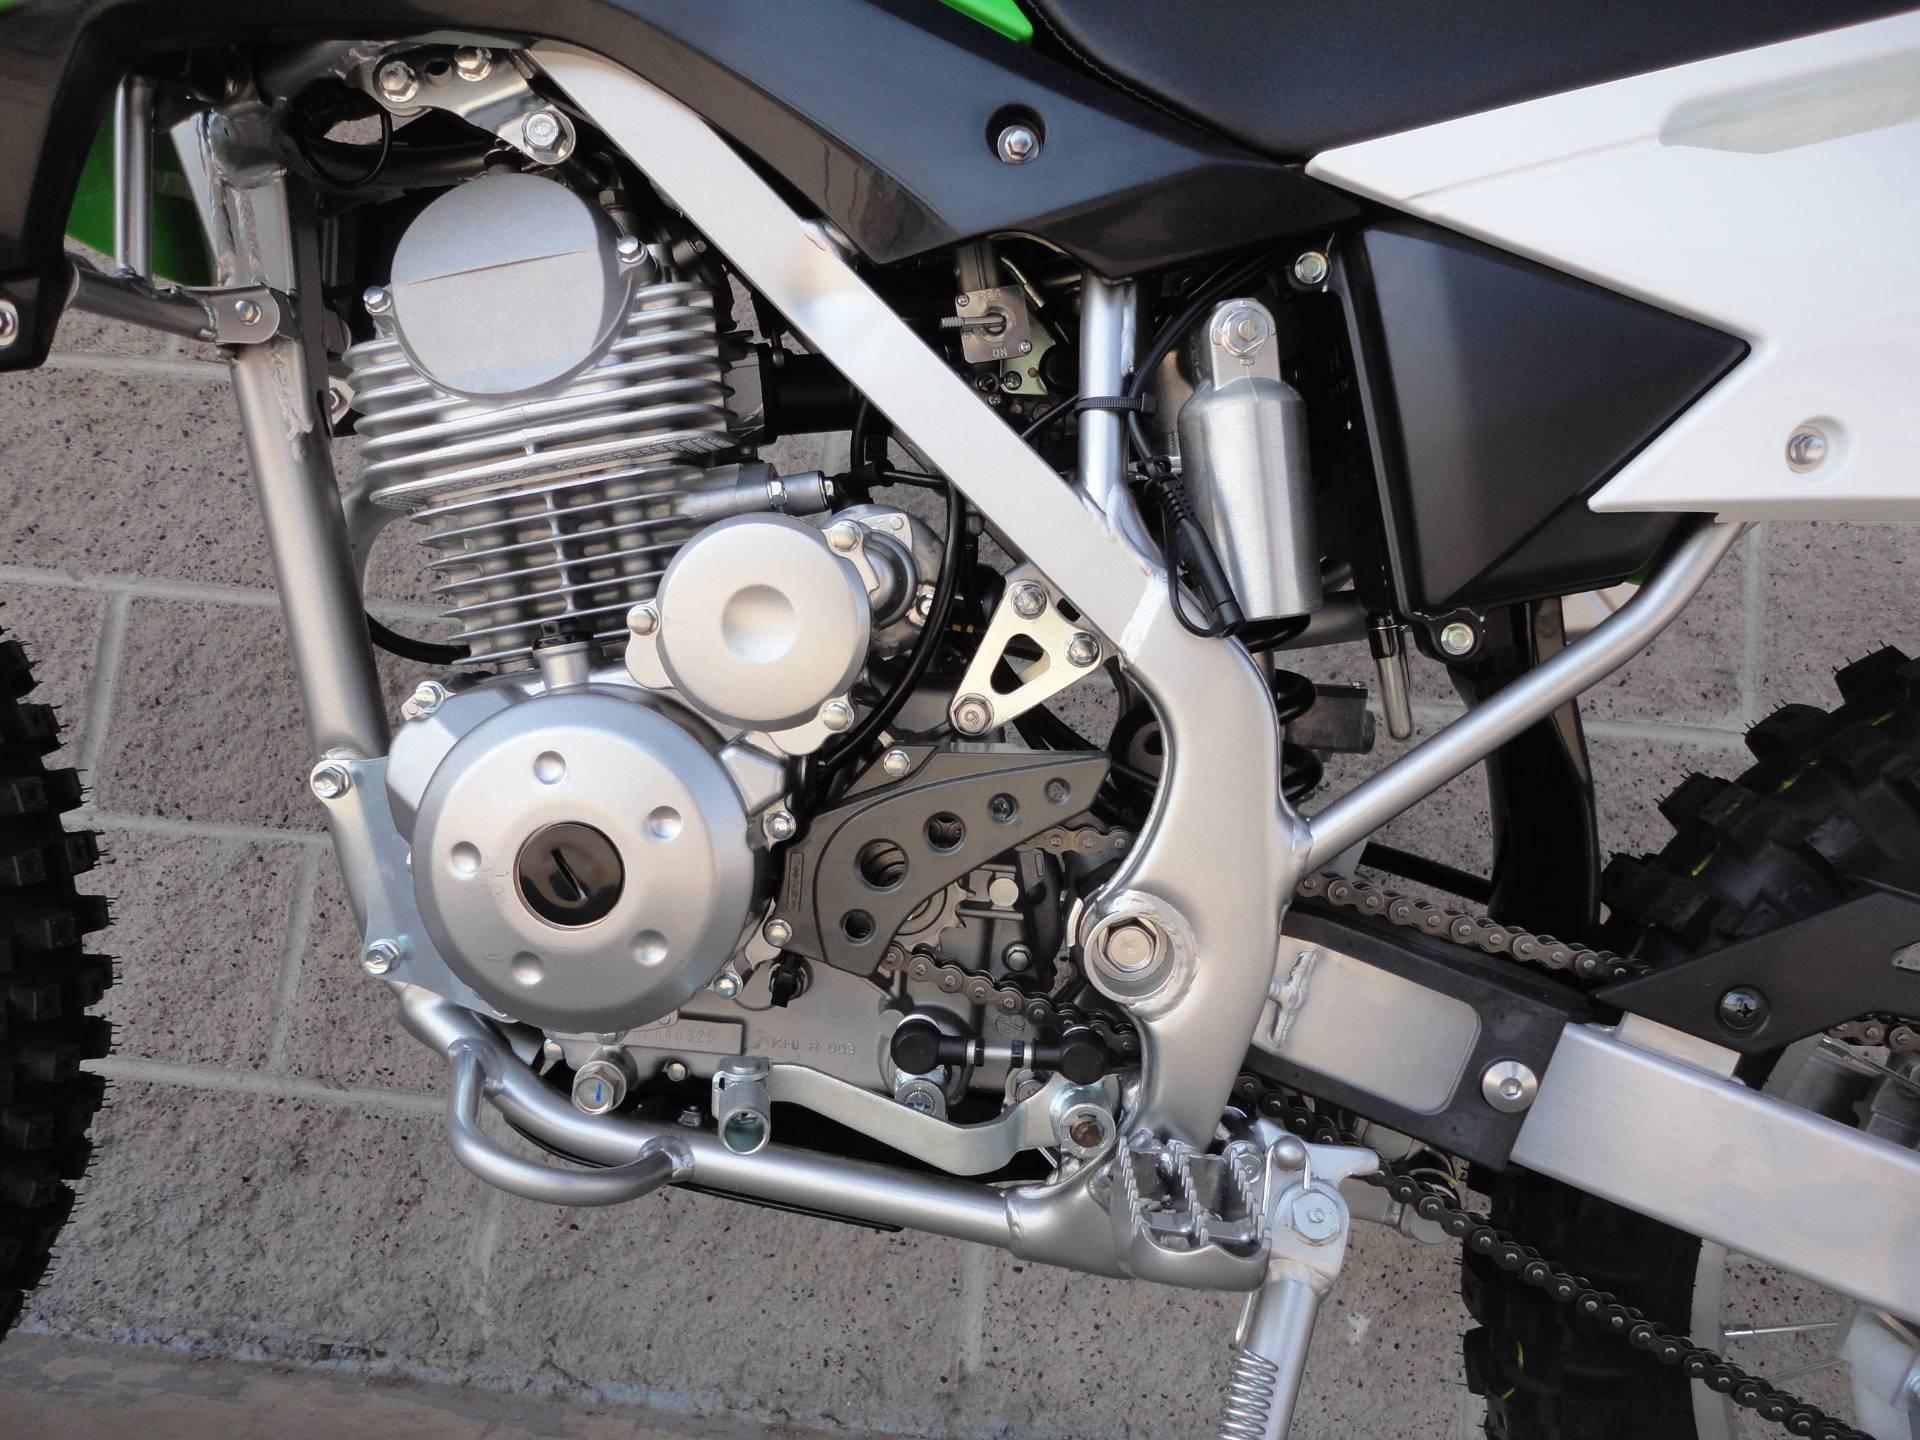 2019 Kawasaki Klx 140g Motorcycles Denver Colorado V6871 Wiring Harness In